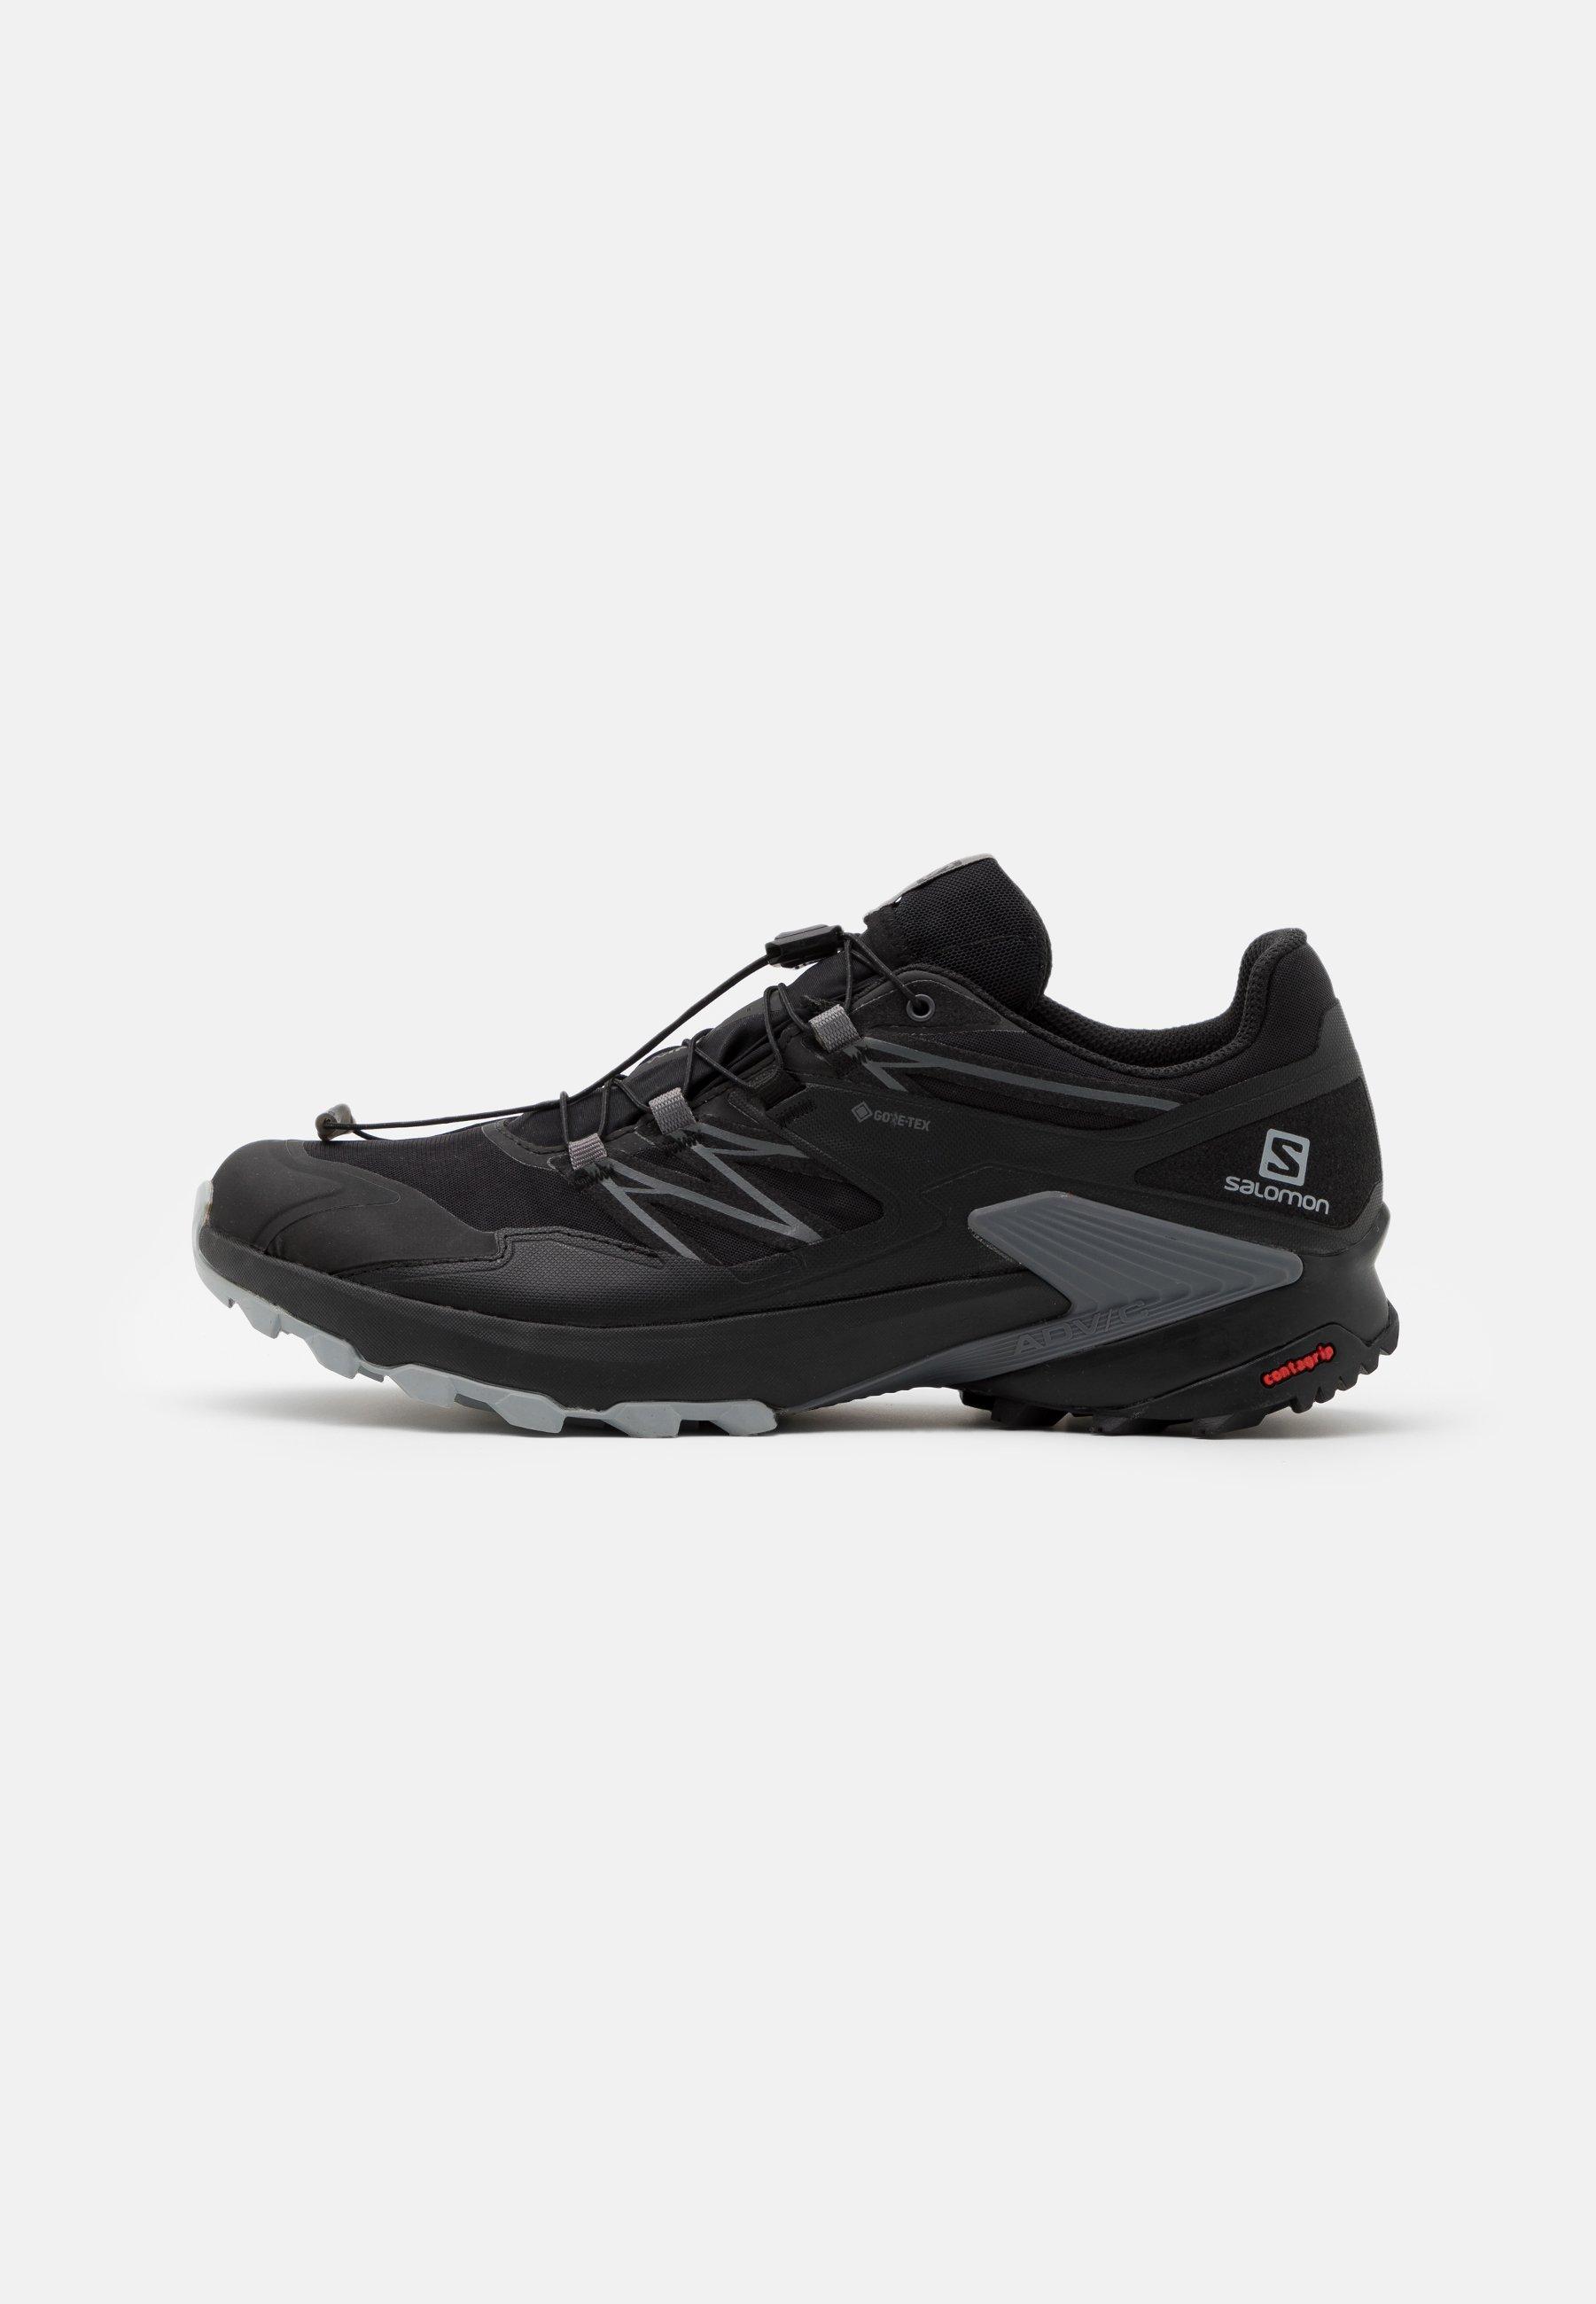 Men WINGS SKY GTX - Trail running shoes